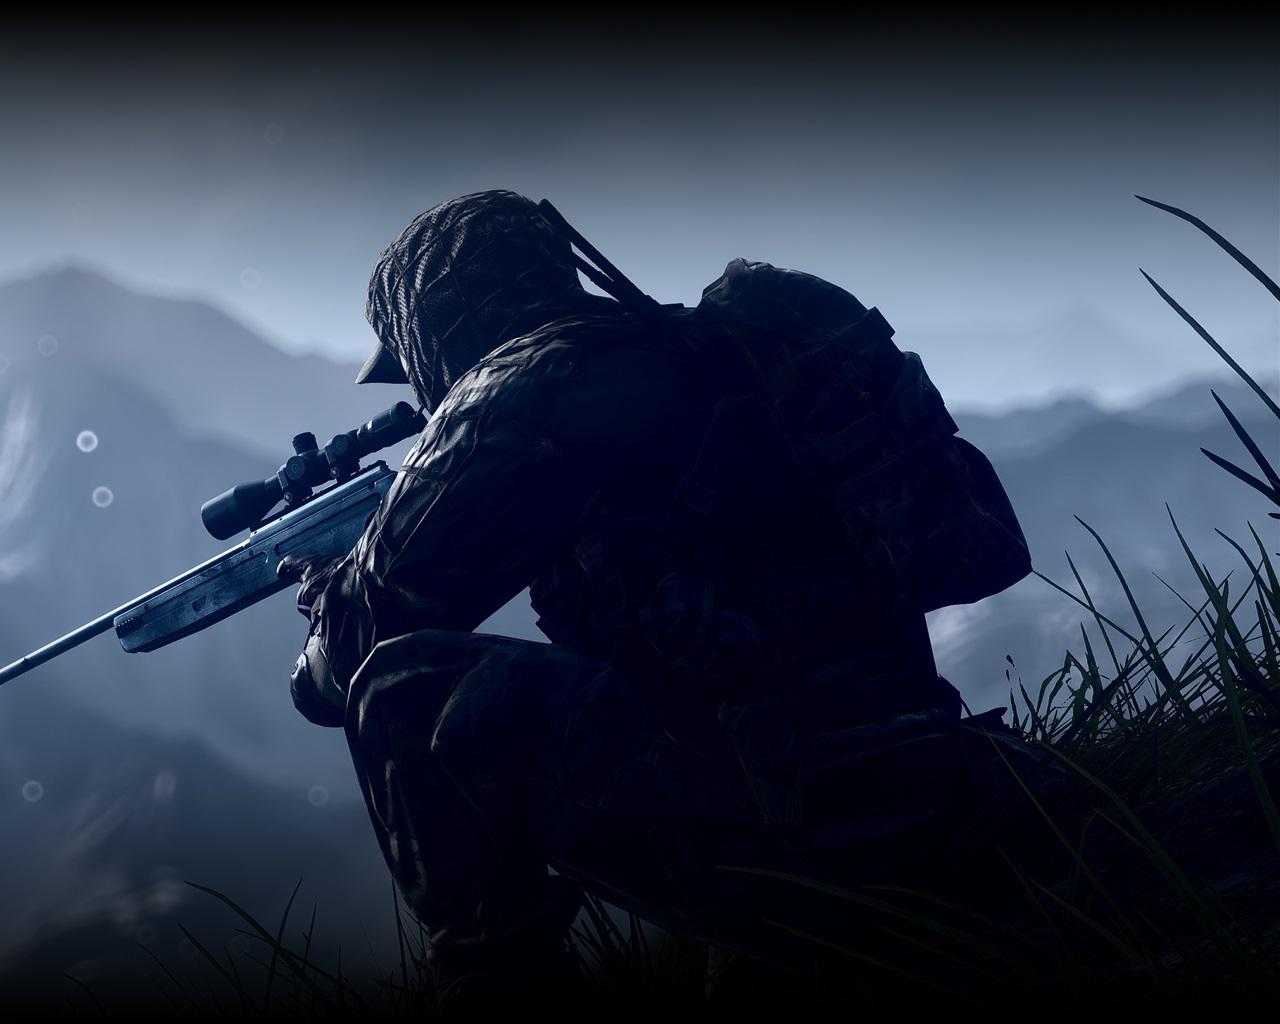 Wallpaper Battlefield 4, soldier, sniper 3840x2160 UHD 4K ...  Battlefield